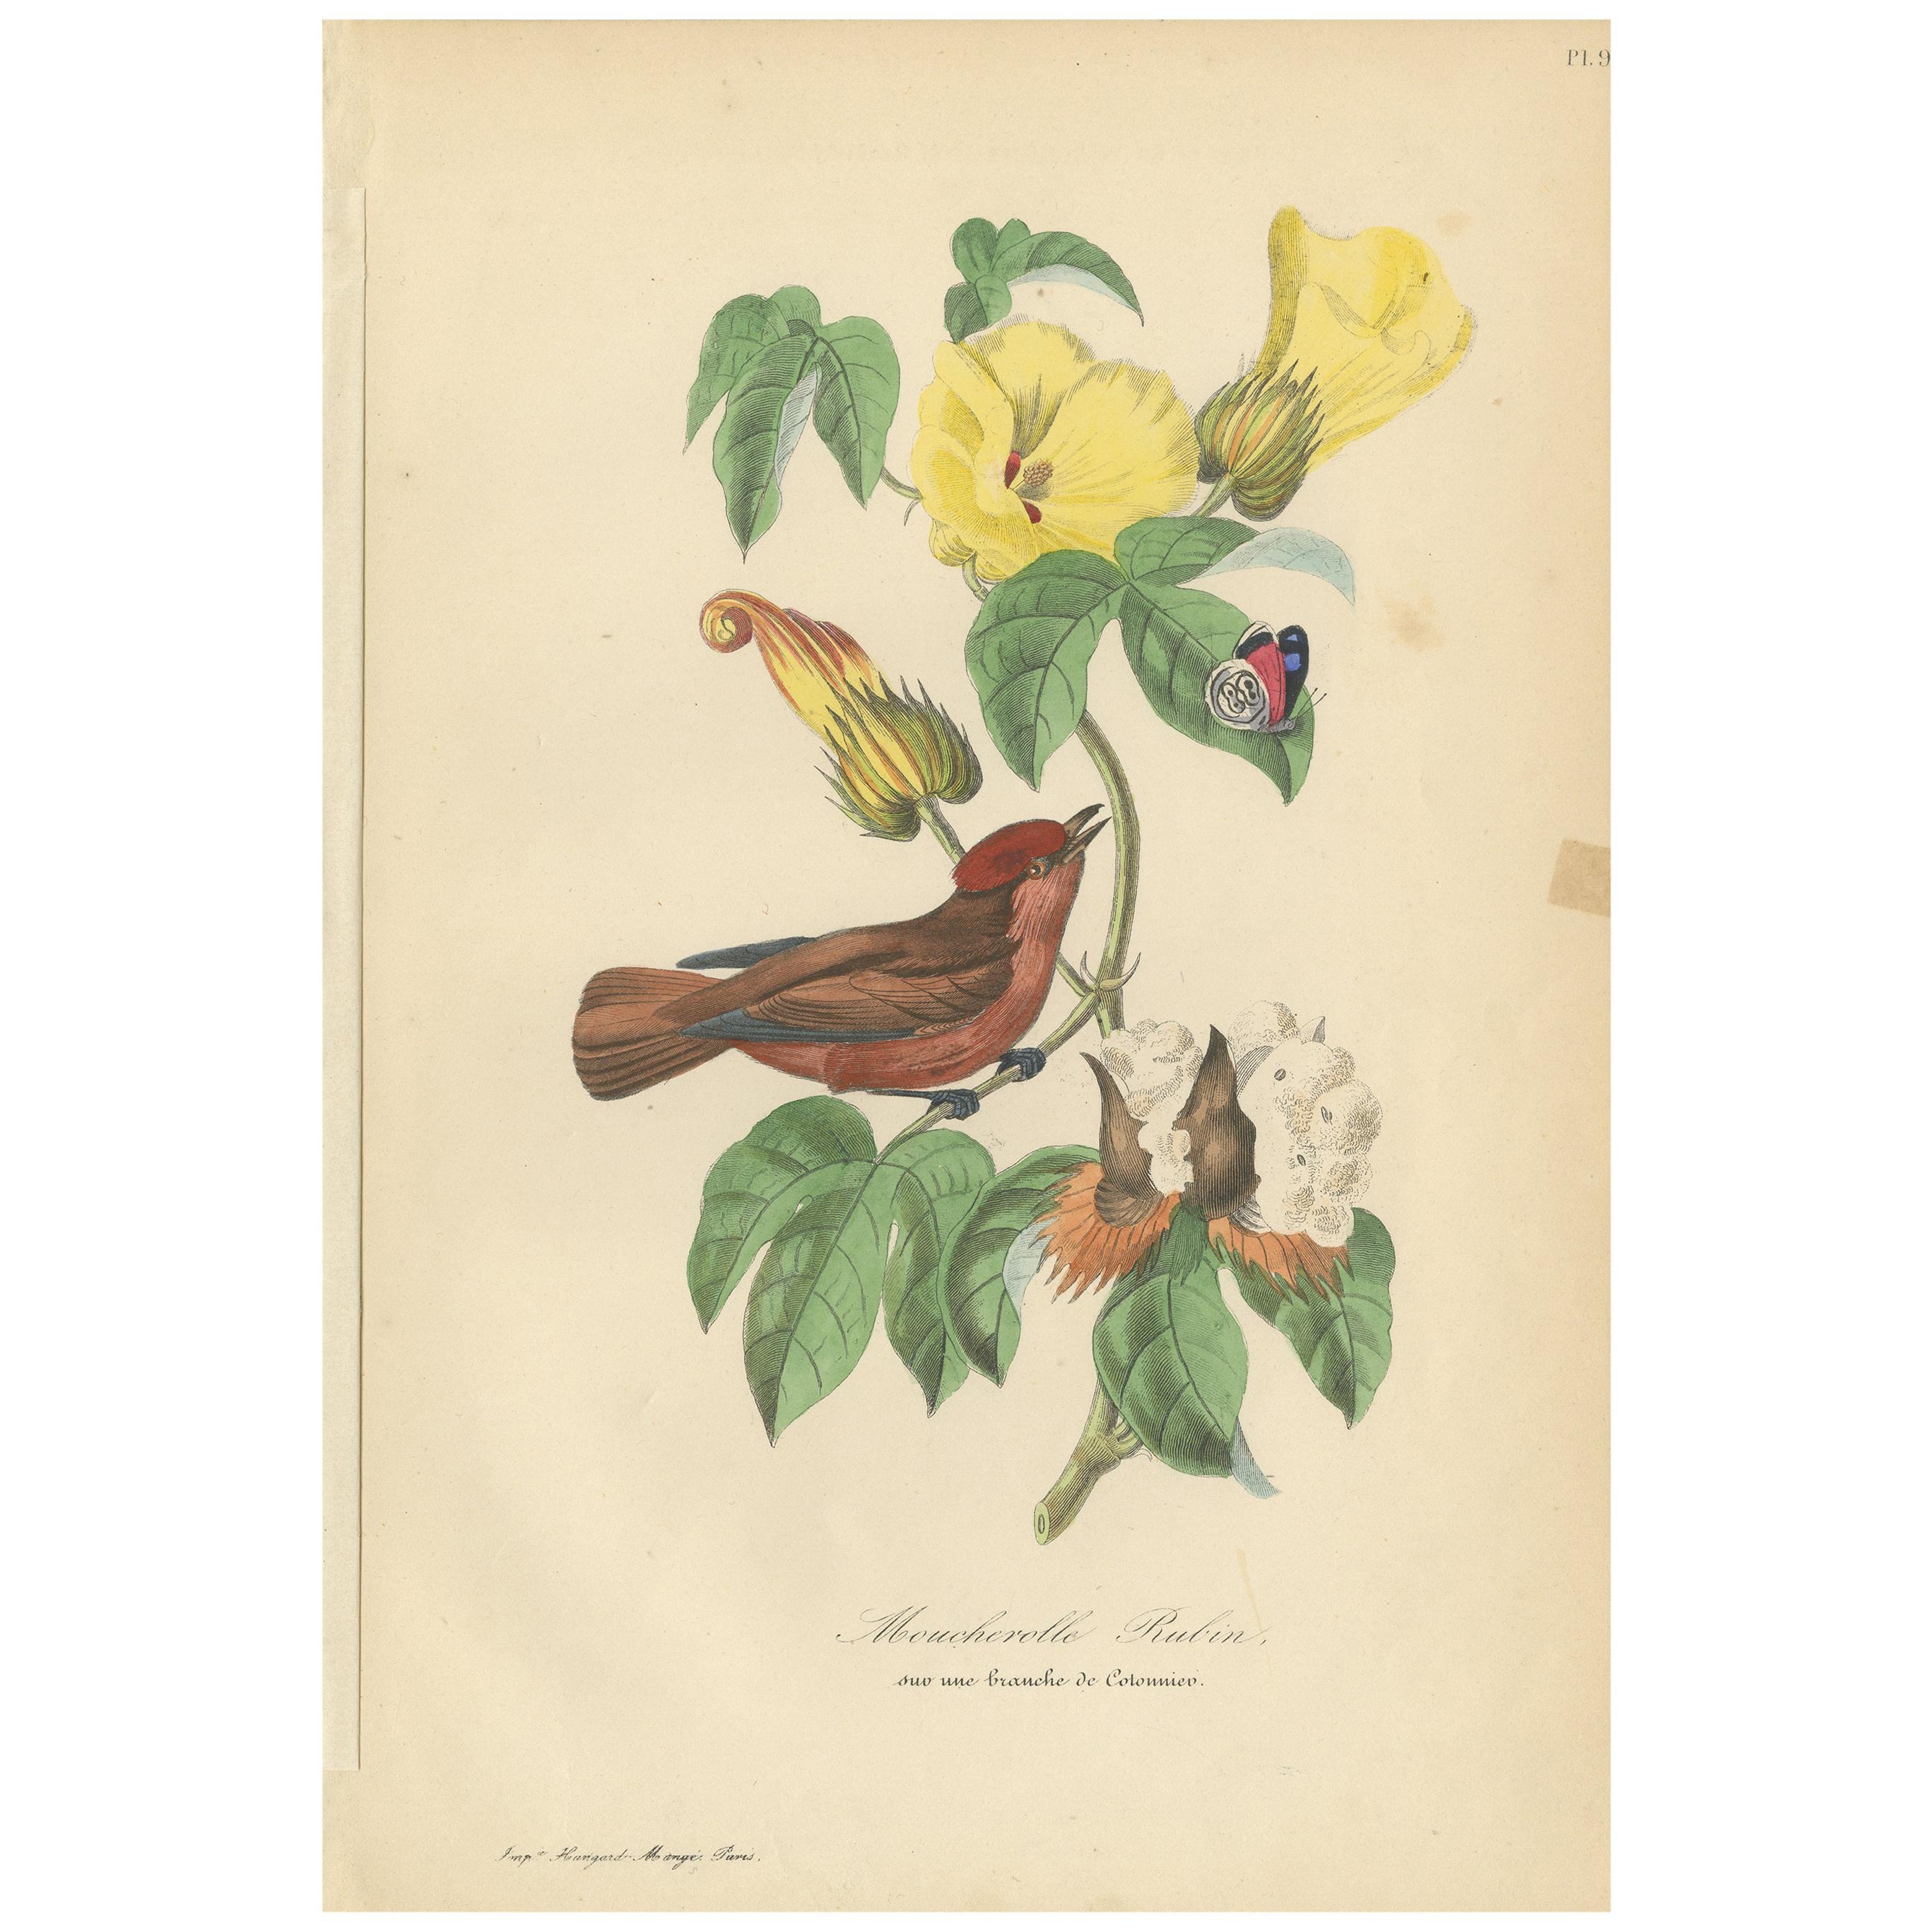 Antique Bird Print of a Phoebe Bird Species '1853'